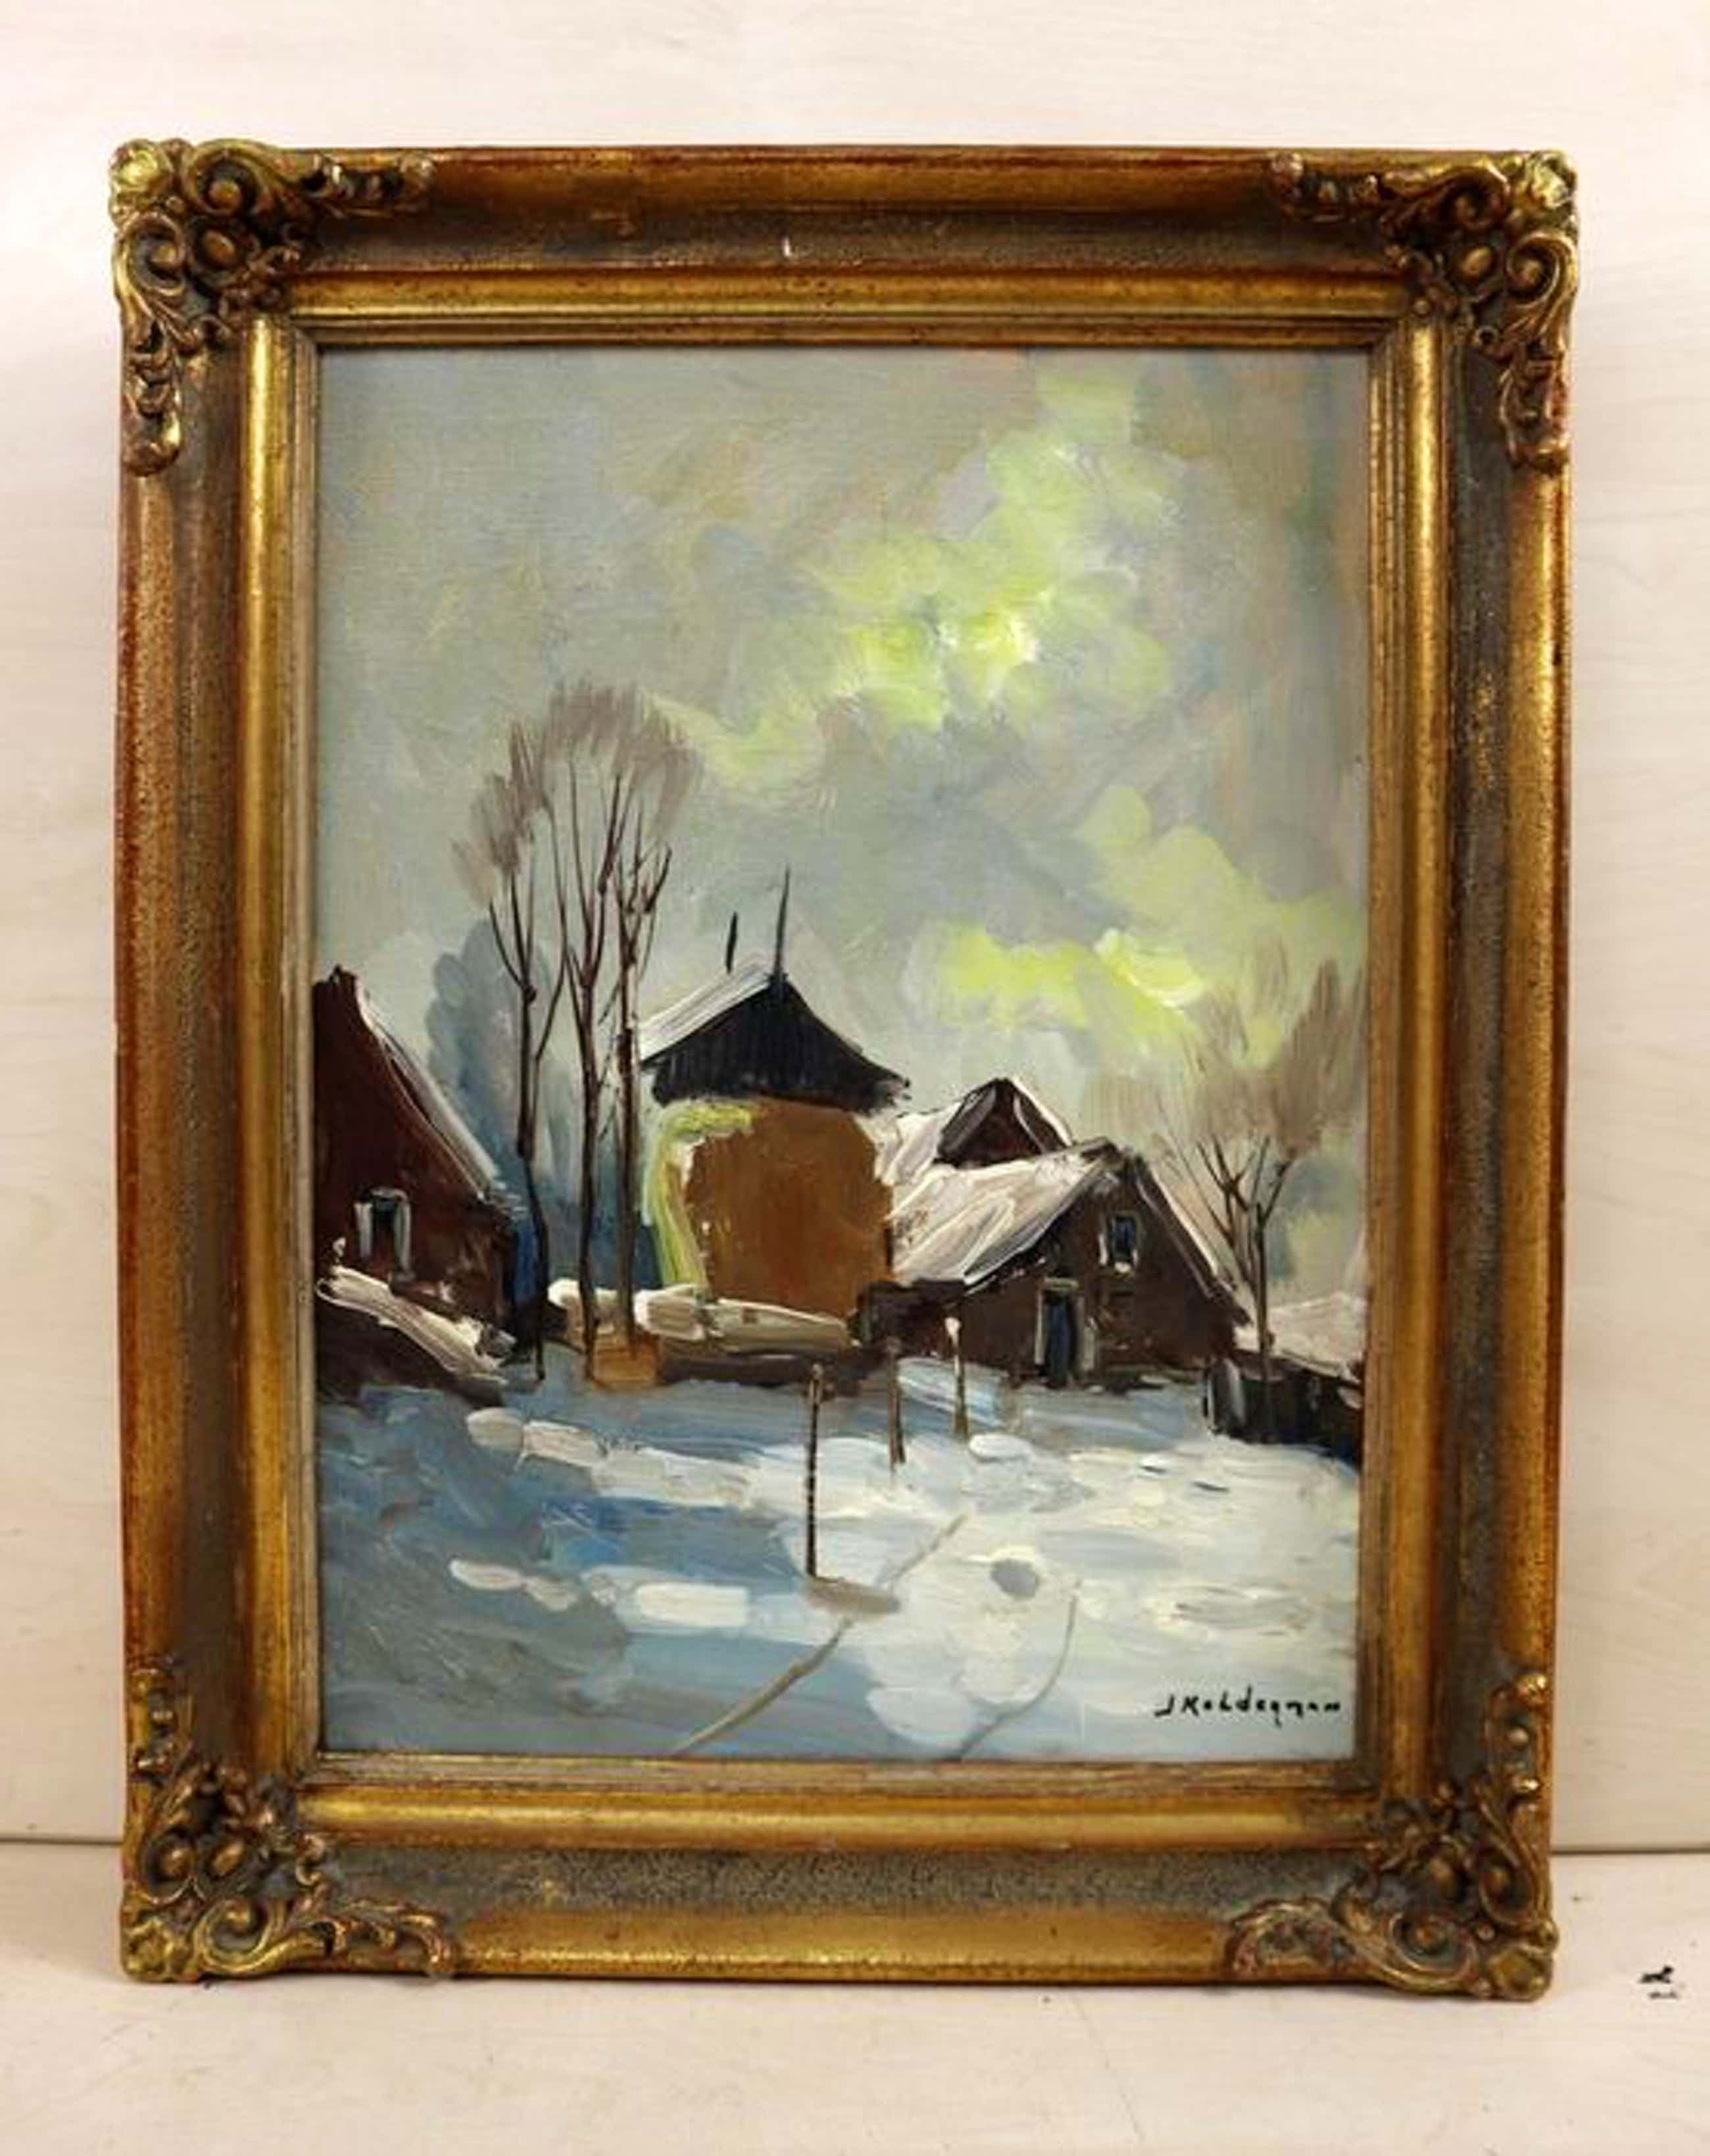 Jan Kelderman - Winter op de boerderij kopen? Bied vanaf 95!